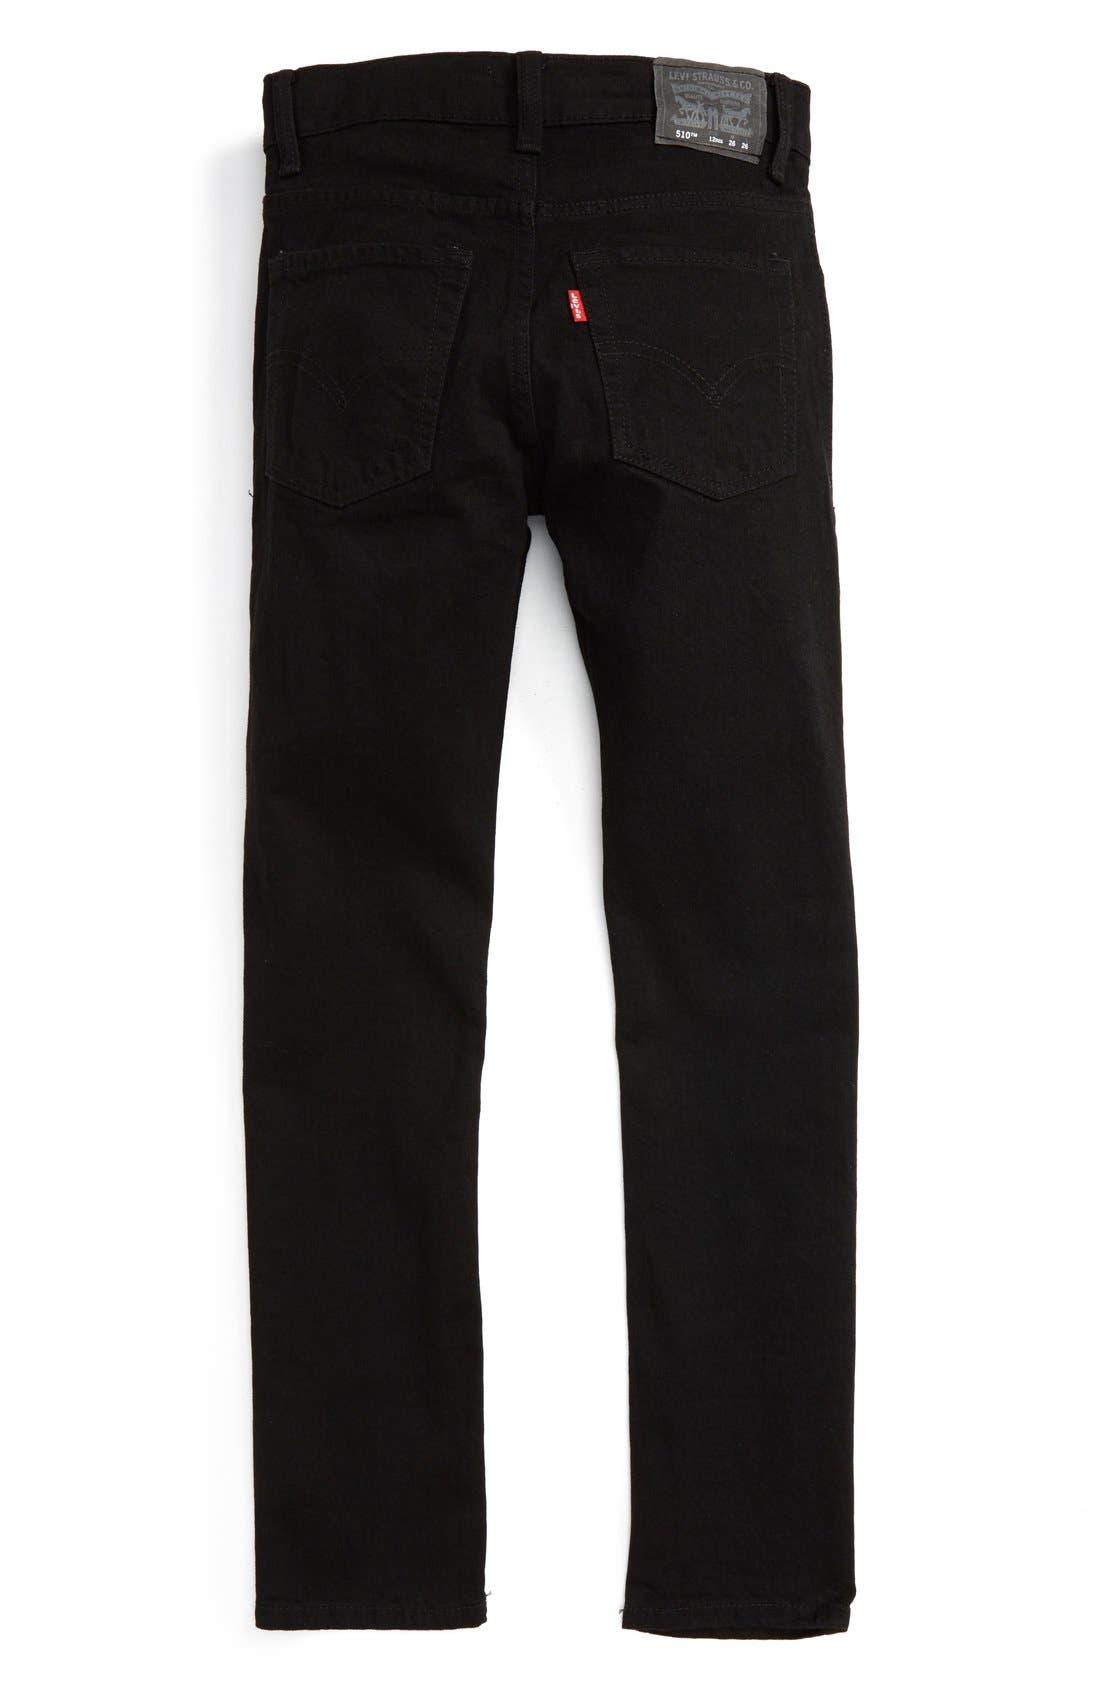 Alternate Image 2  - Levi's® 510™ Skinny Fit Jeans (Toddler Boys, Little Boys & Big Boys)